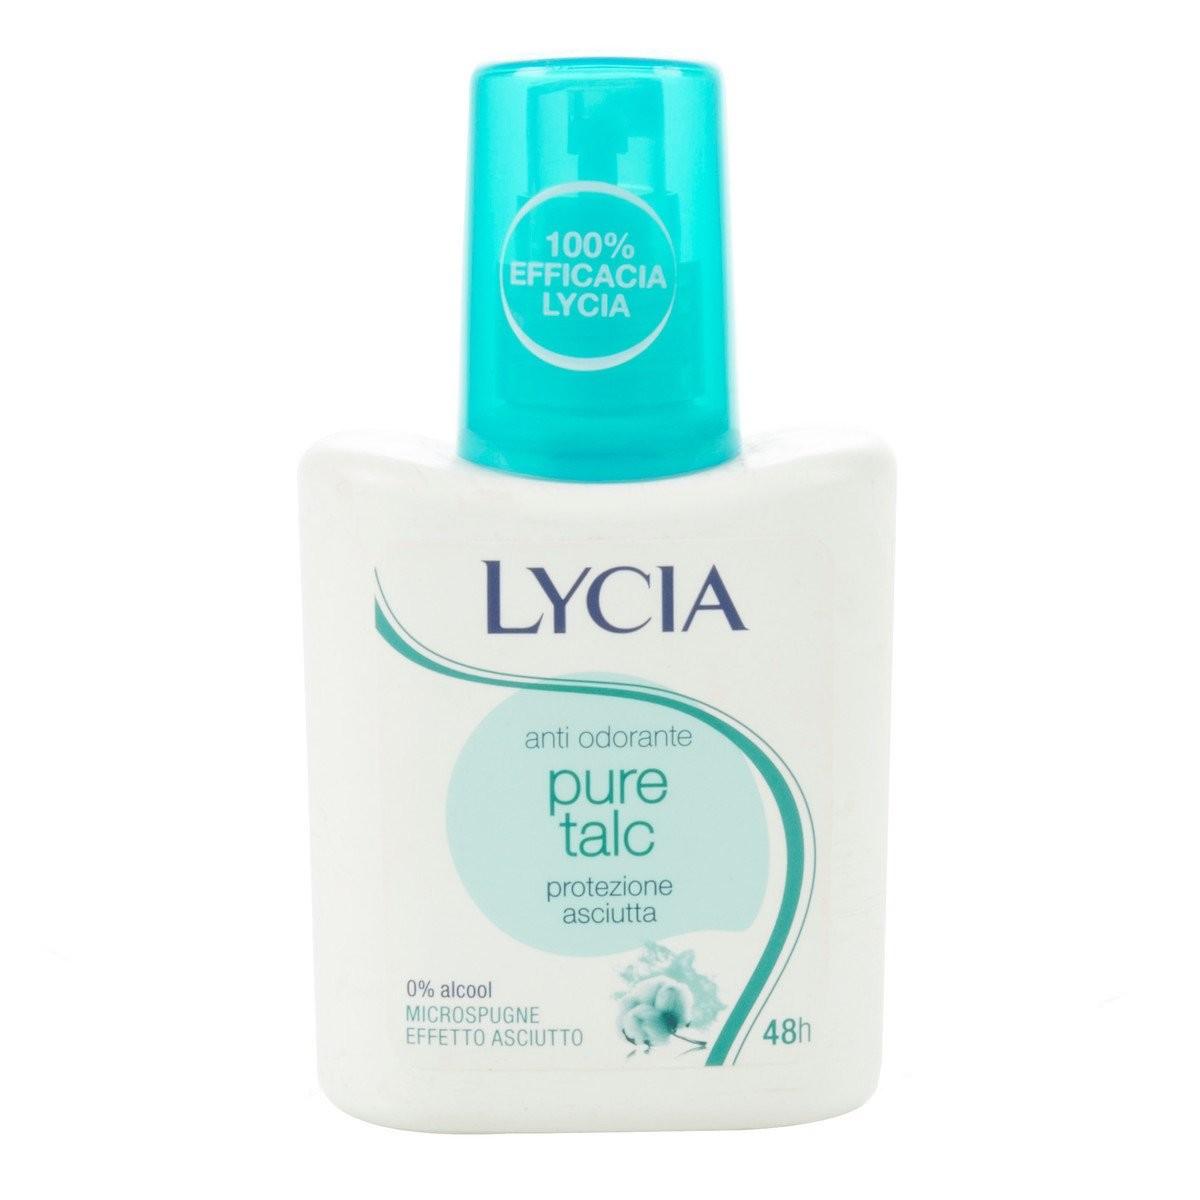 Lycia Deodorante vapo Pure Talc